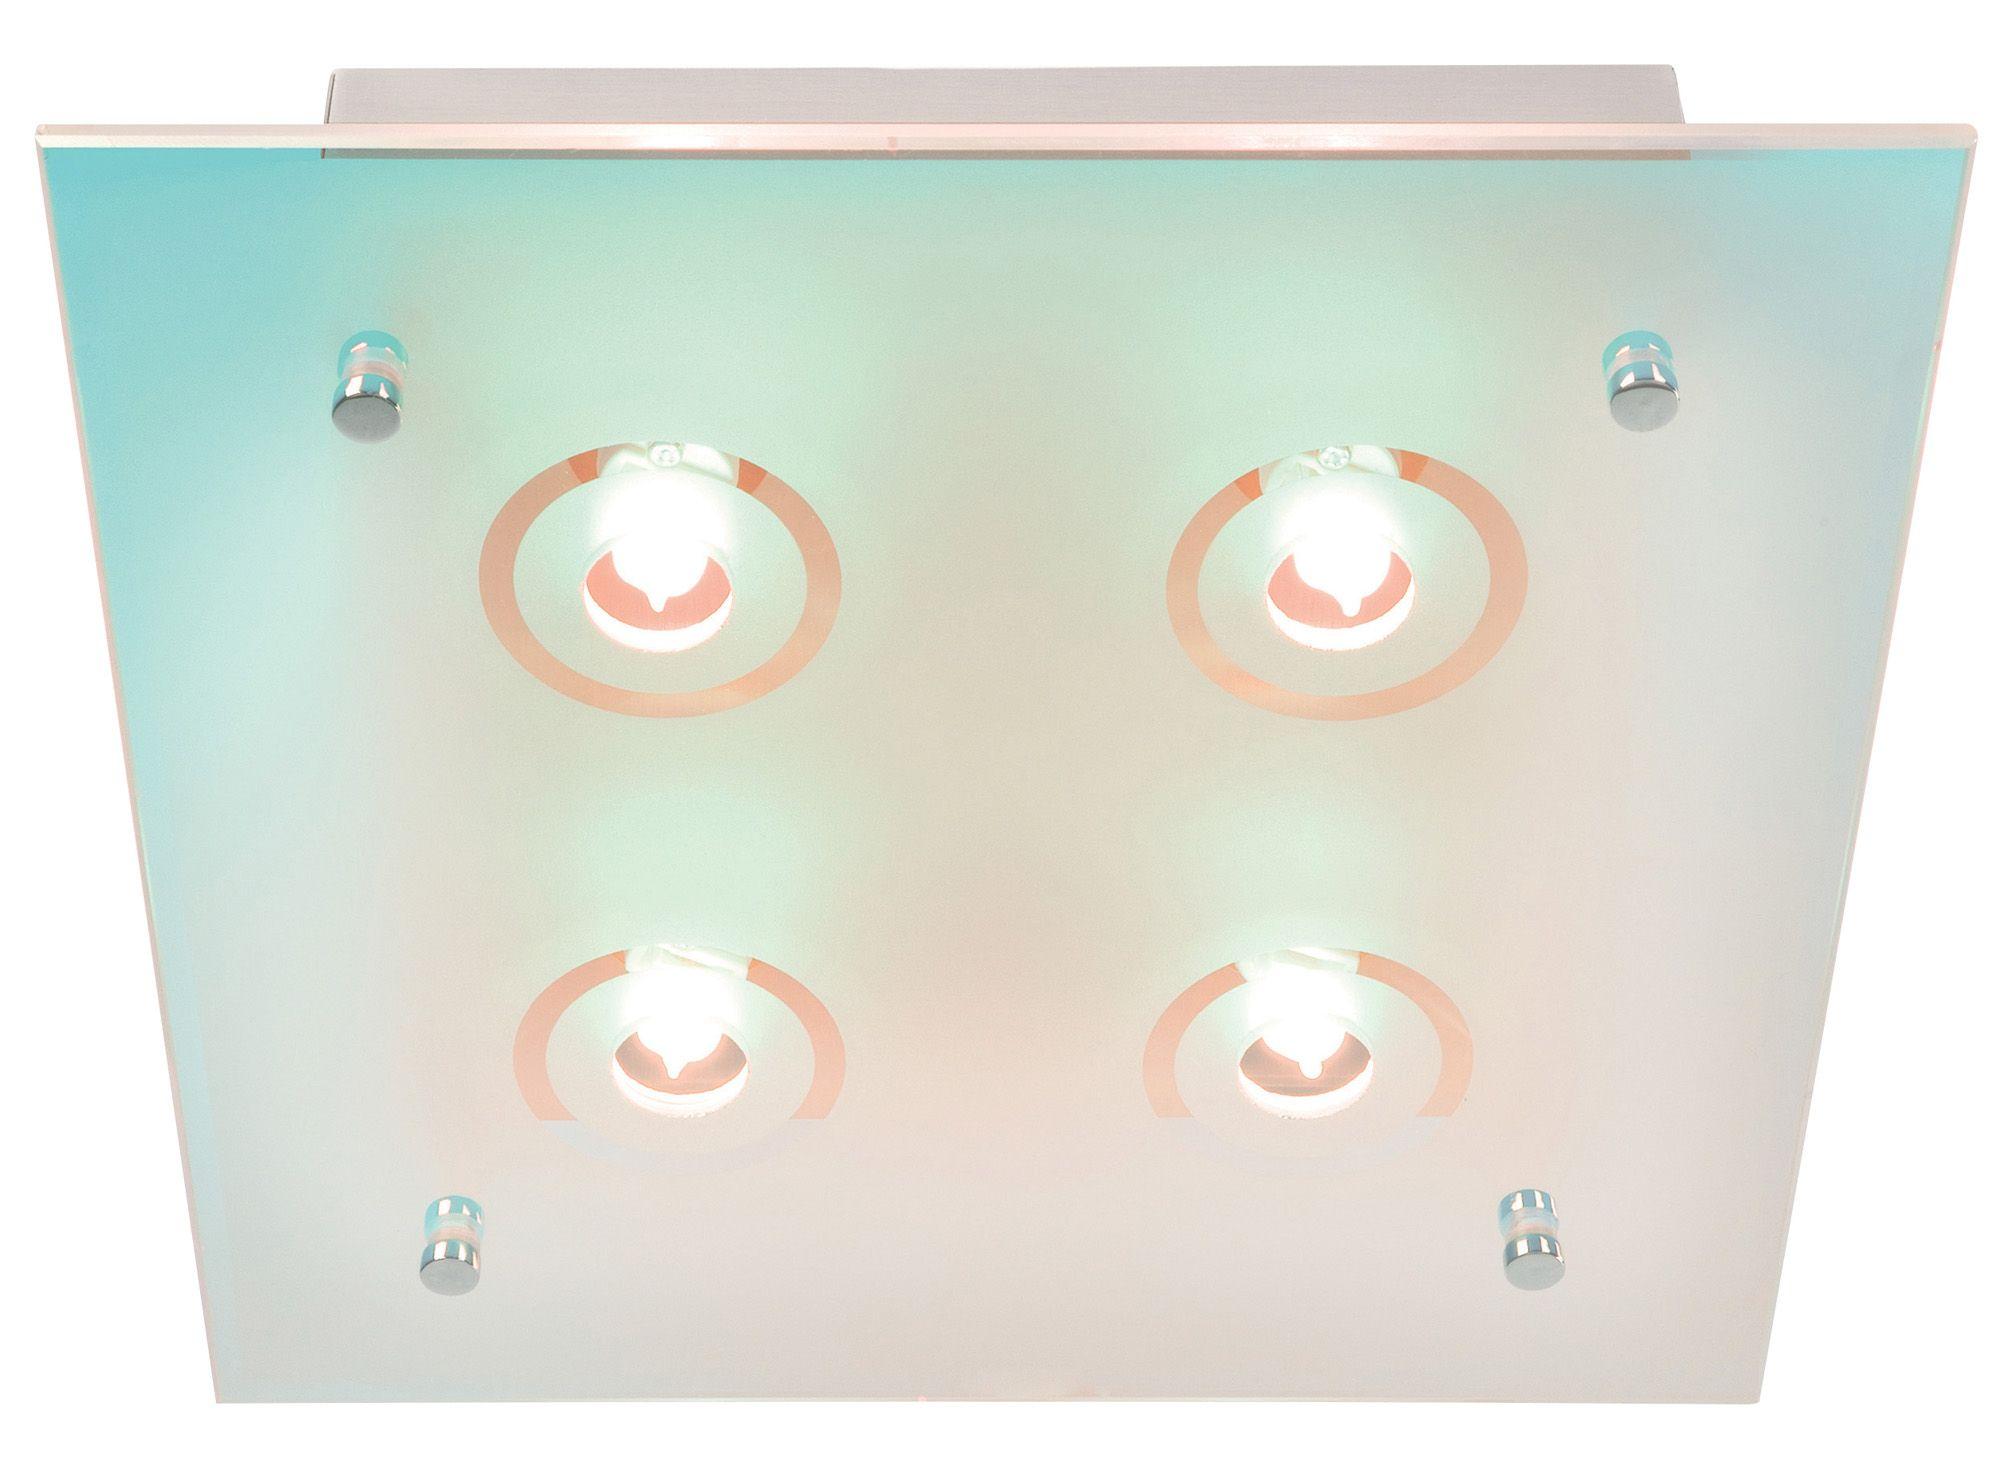 Bathroom Ceiling Lights At B&Q lightsb&q 1 flush ceiling light | departments | diy at b&q